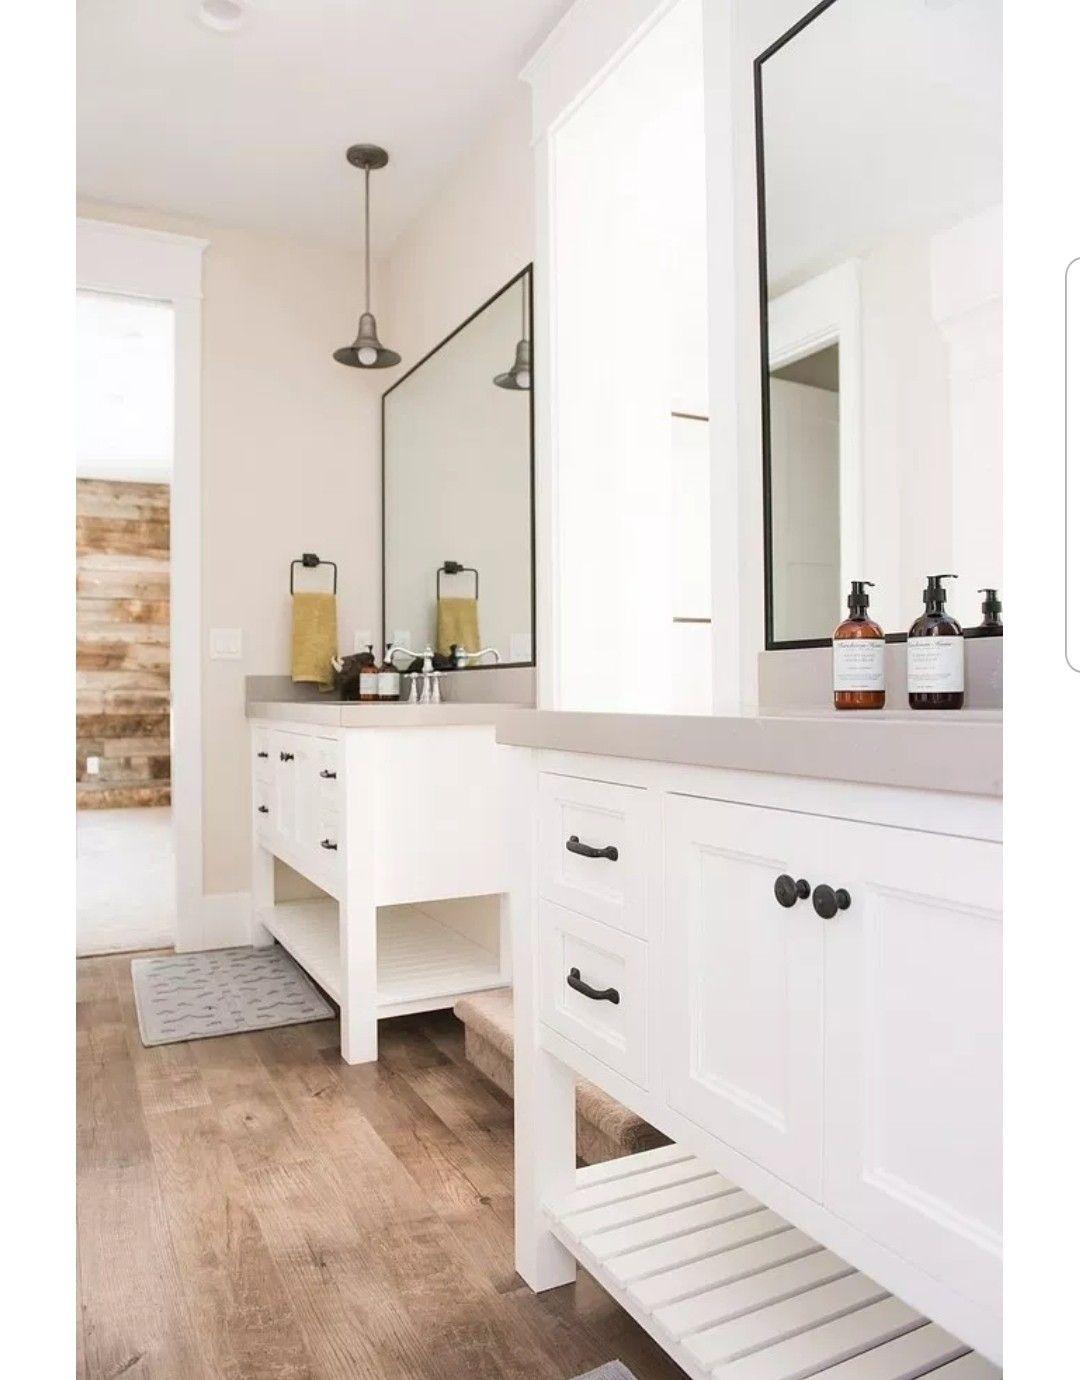 pinsdubus on salle de bain  modern farmhouse